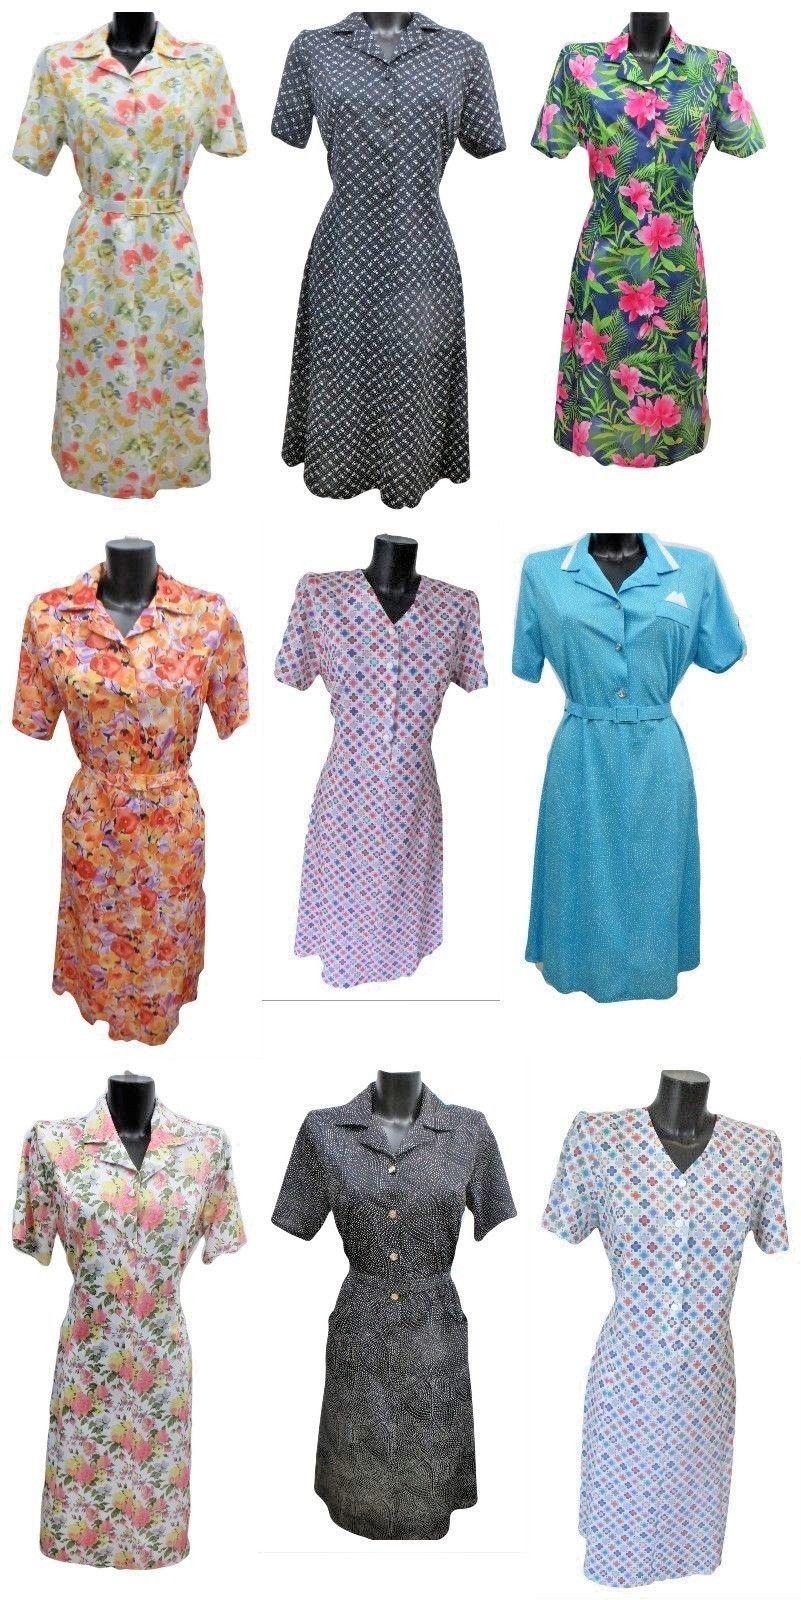 Summer Dress For The Older Woman. Vintage Dresses Elderly Ladies